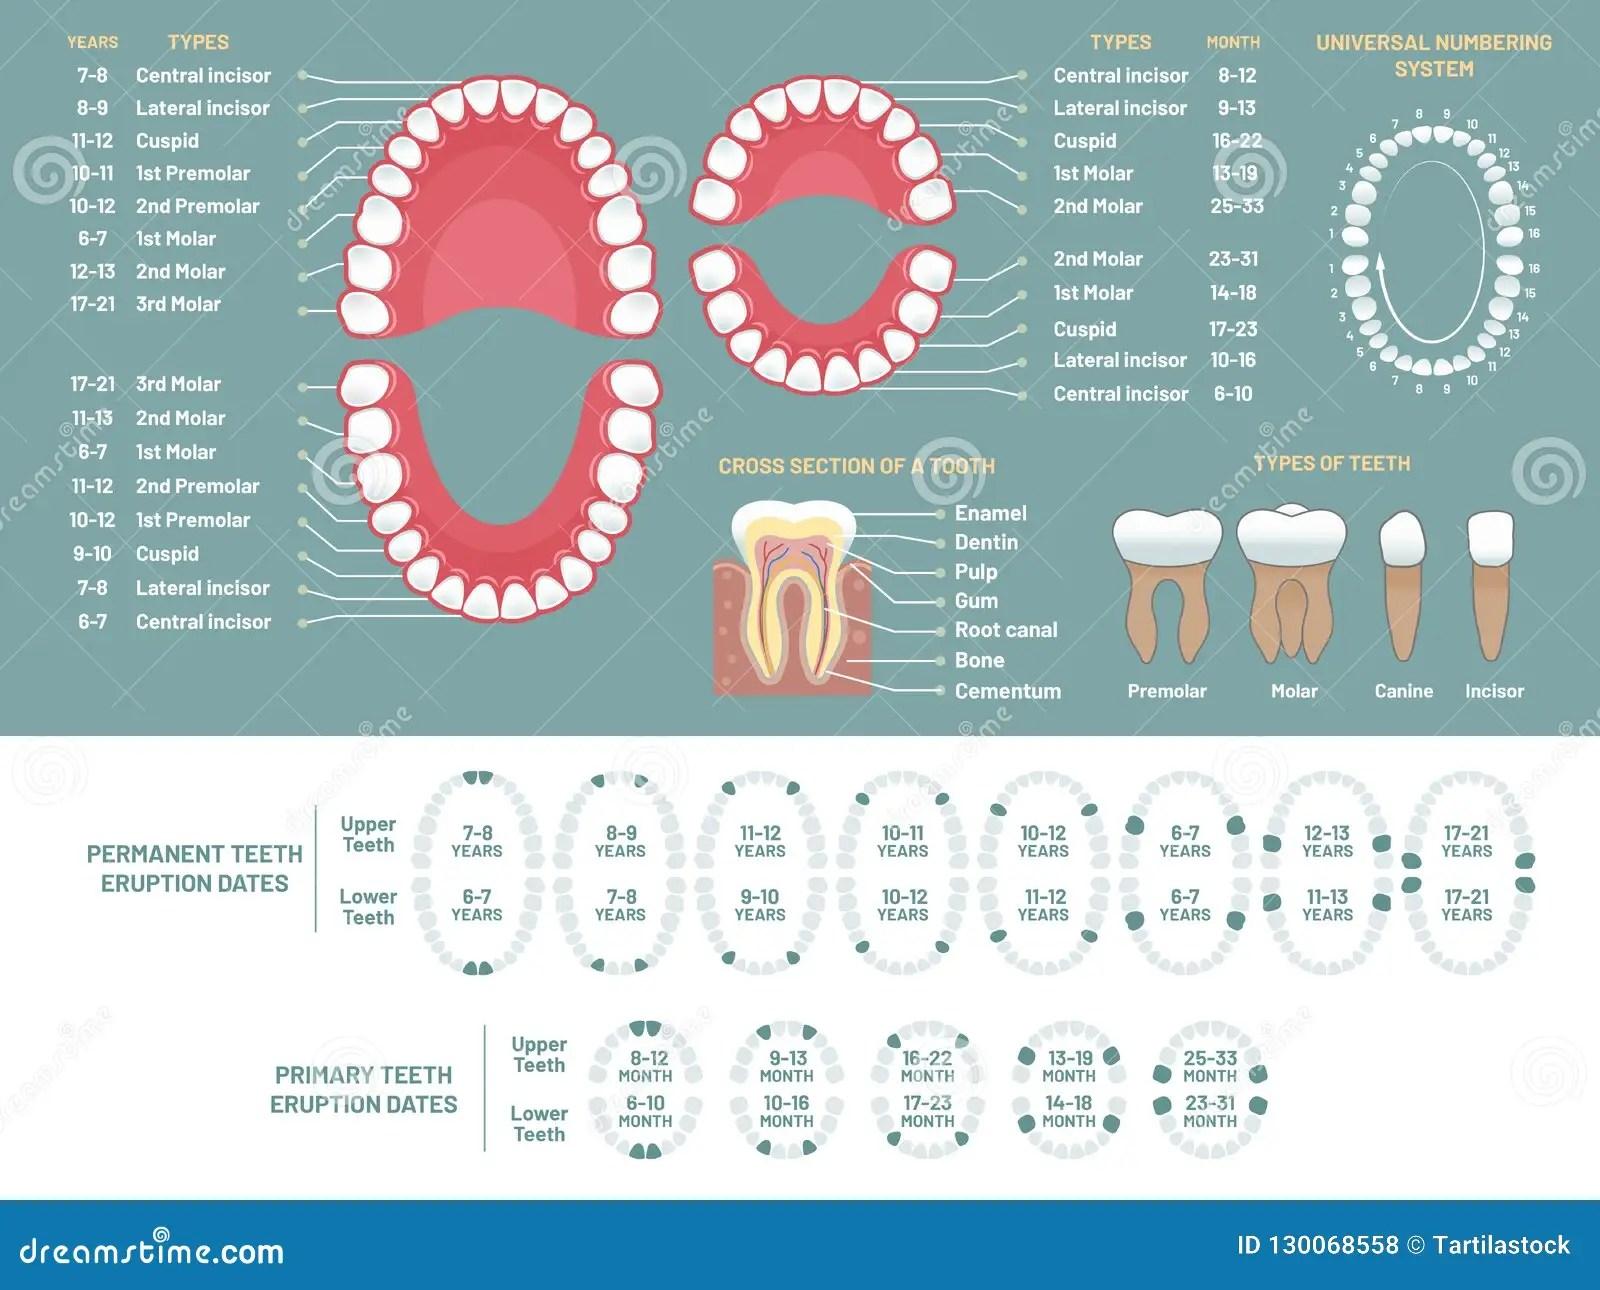 hight resolution of tooth anatomy chart orthodontist human teeth loss diagram dental scheme and orthodontics medical oral health tooth anatomy or prosthetics